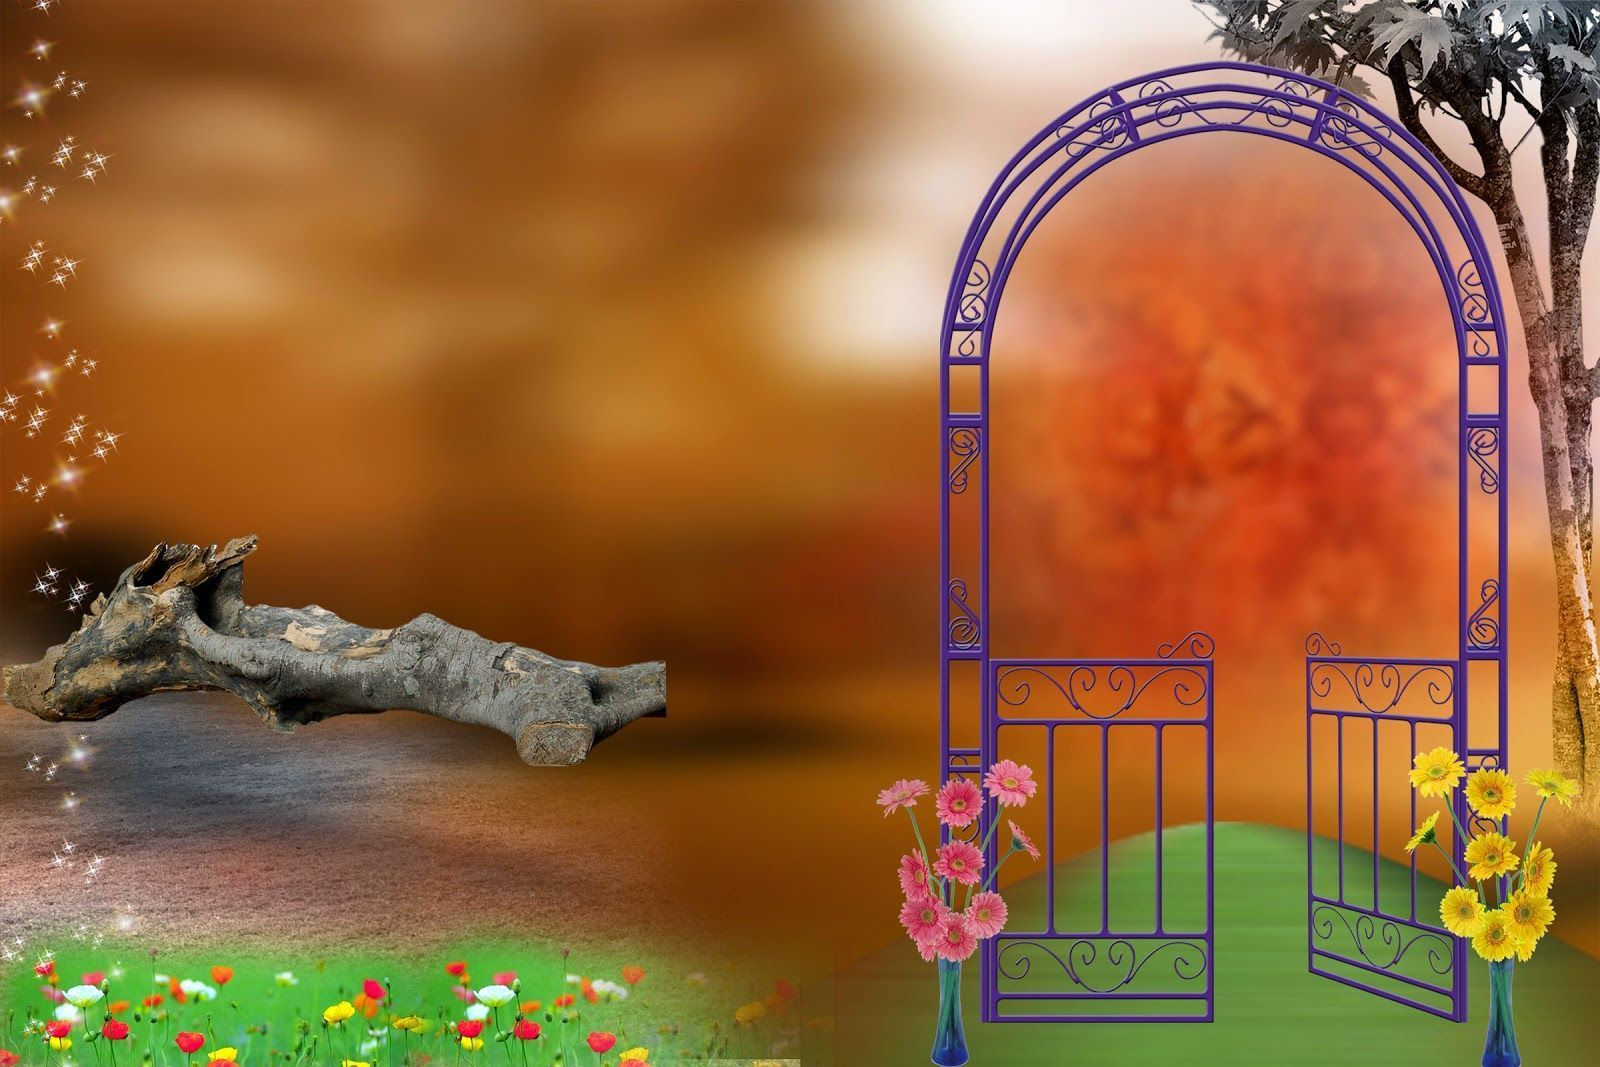 Wedding Album Design Psd Background, Room Photo Editing - Adobe Photoshop 7.0 Background Designs Free Download , HD Wallpaper & Backgrounds